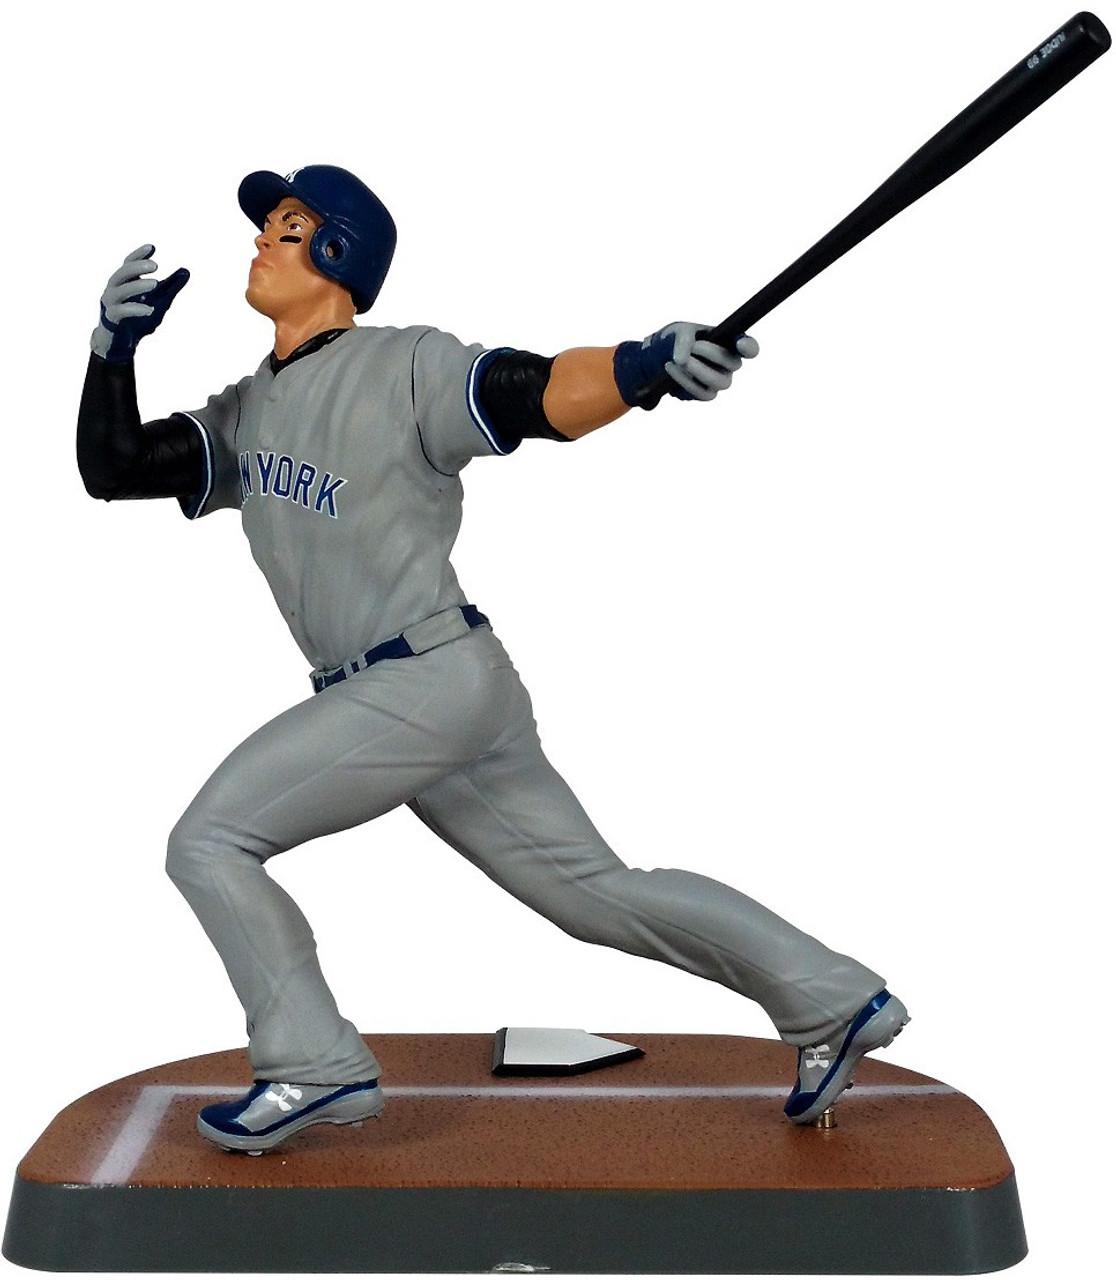 MLB New York Yankees 2017 Aaron Judge Action Figure All